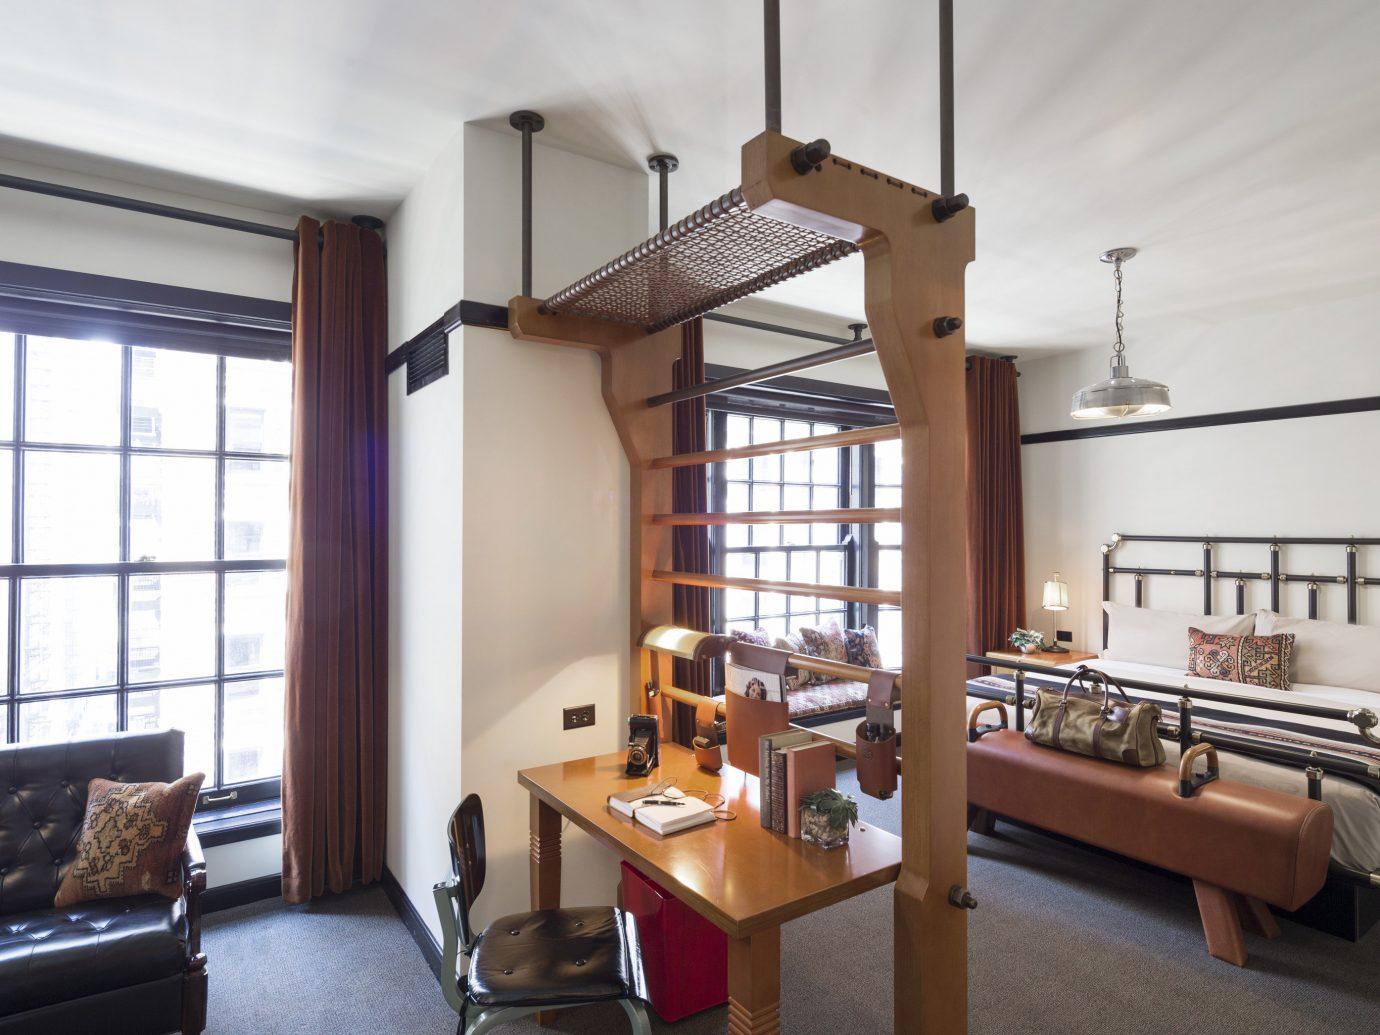 Trip Ideas indoor floor room wall window Living property interior design living room loft home real estate cottage condominium furniture apartment window covering